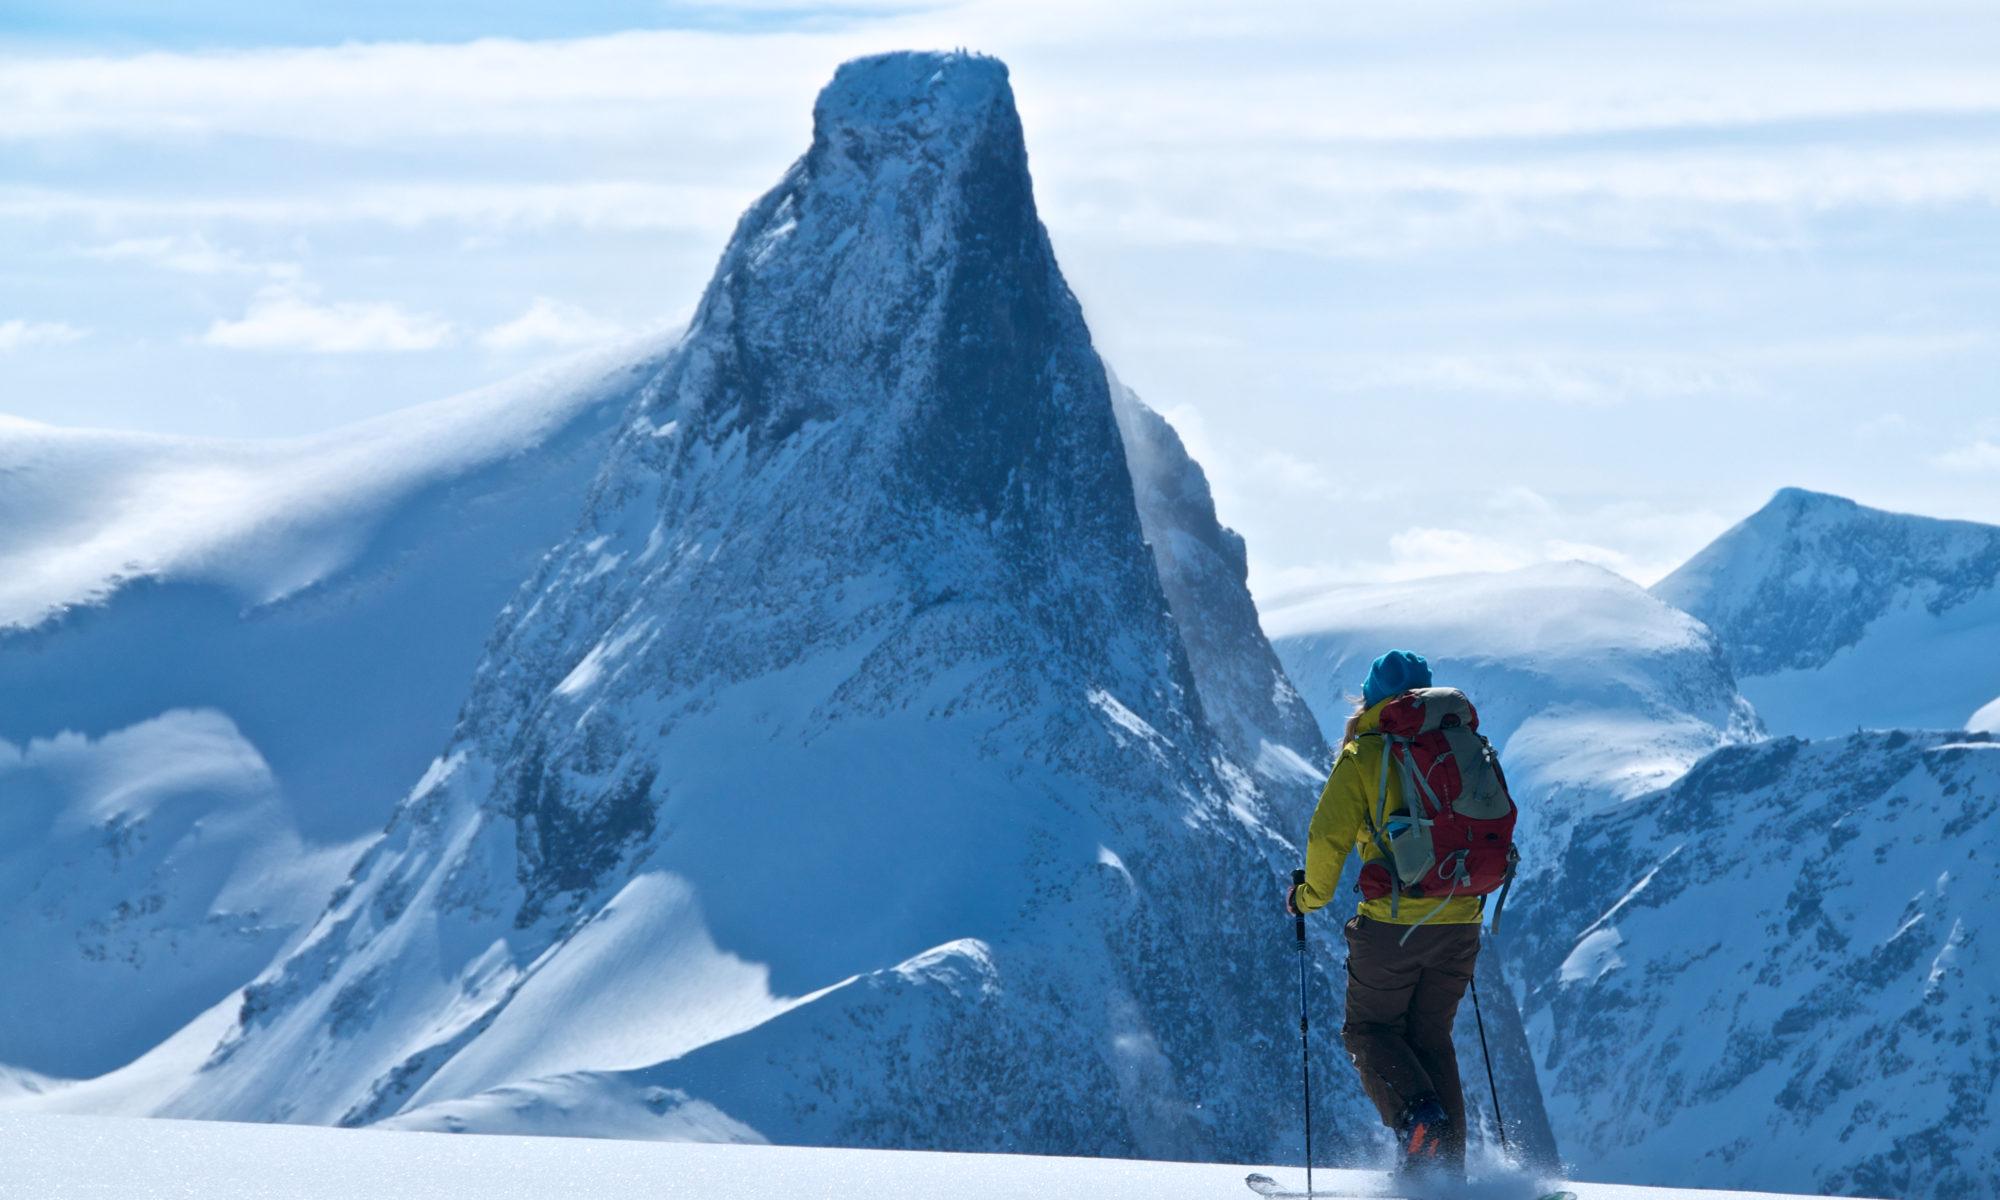 Skiing at Mt. Blånebba in Isfjorden, Romsdal